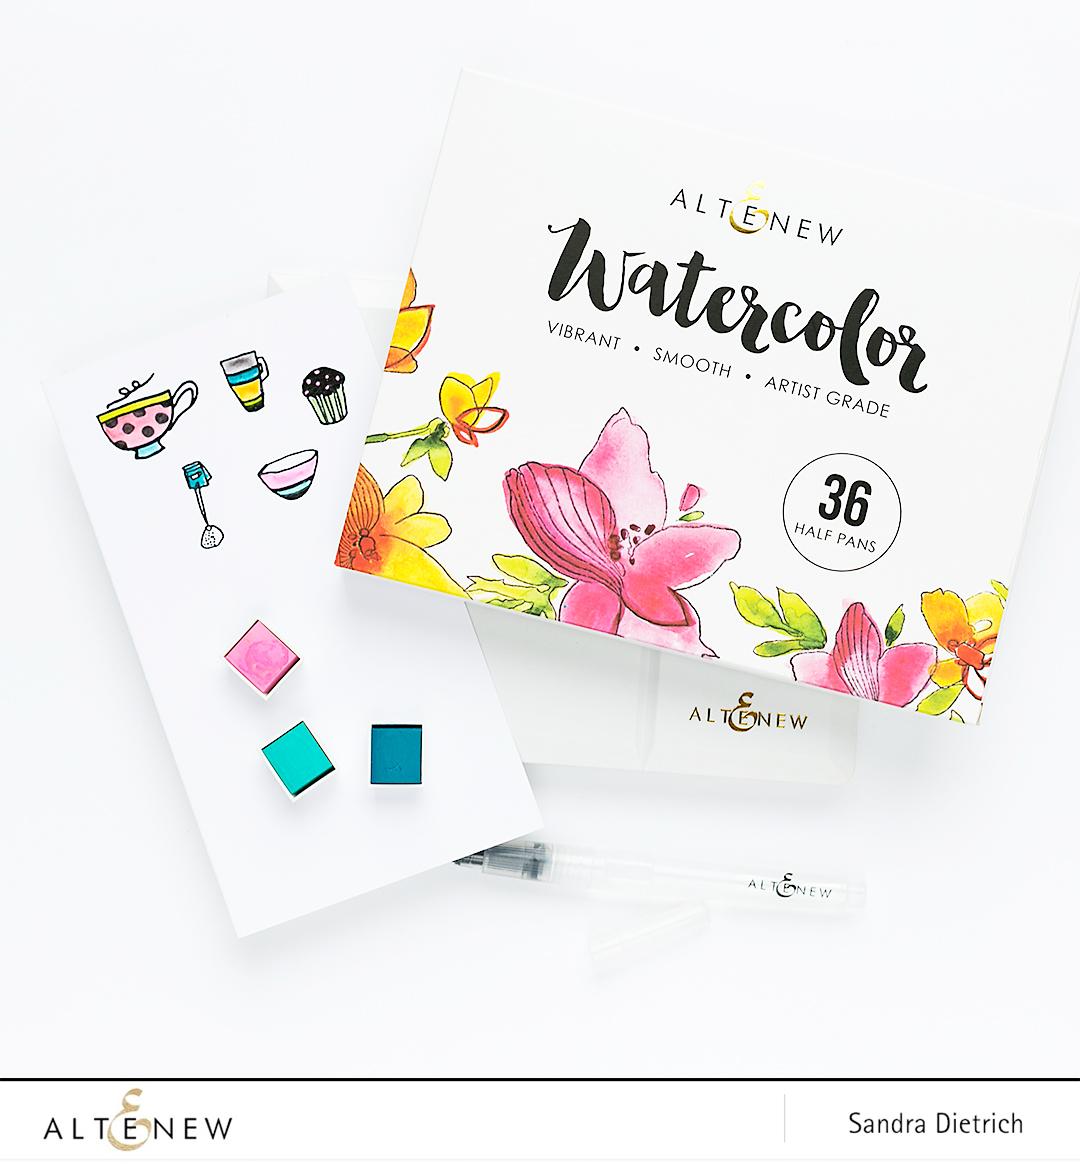 https://altenew.com/products/watercolor-36-pan-set